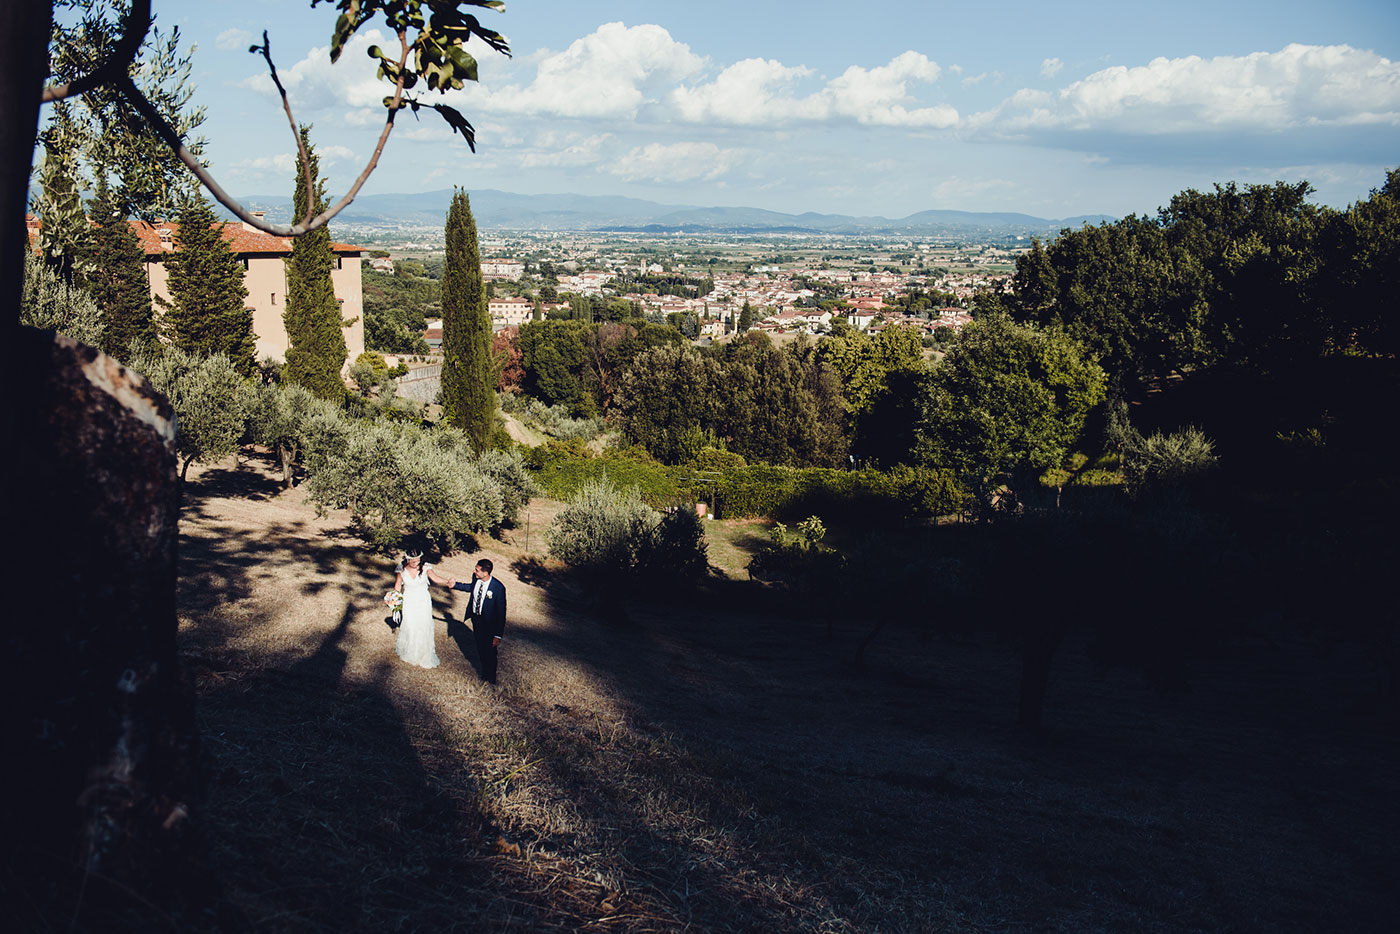 Ilaria & Emiliano's Romantic Tuscan wedding